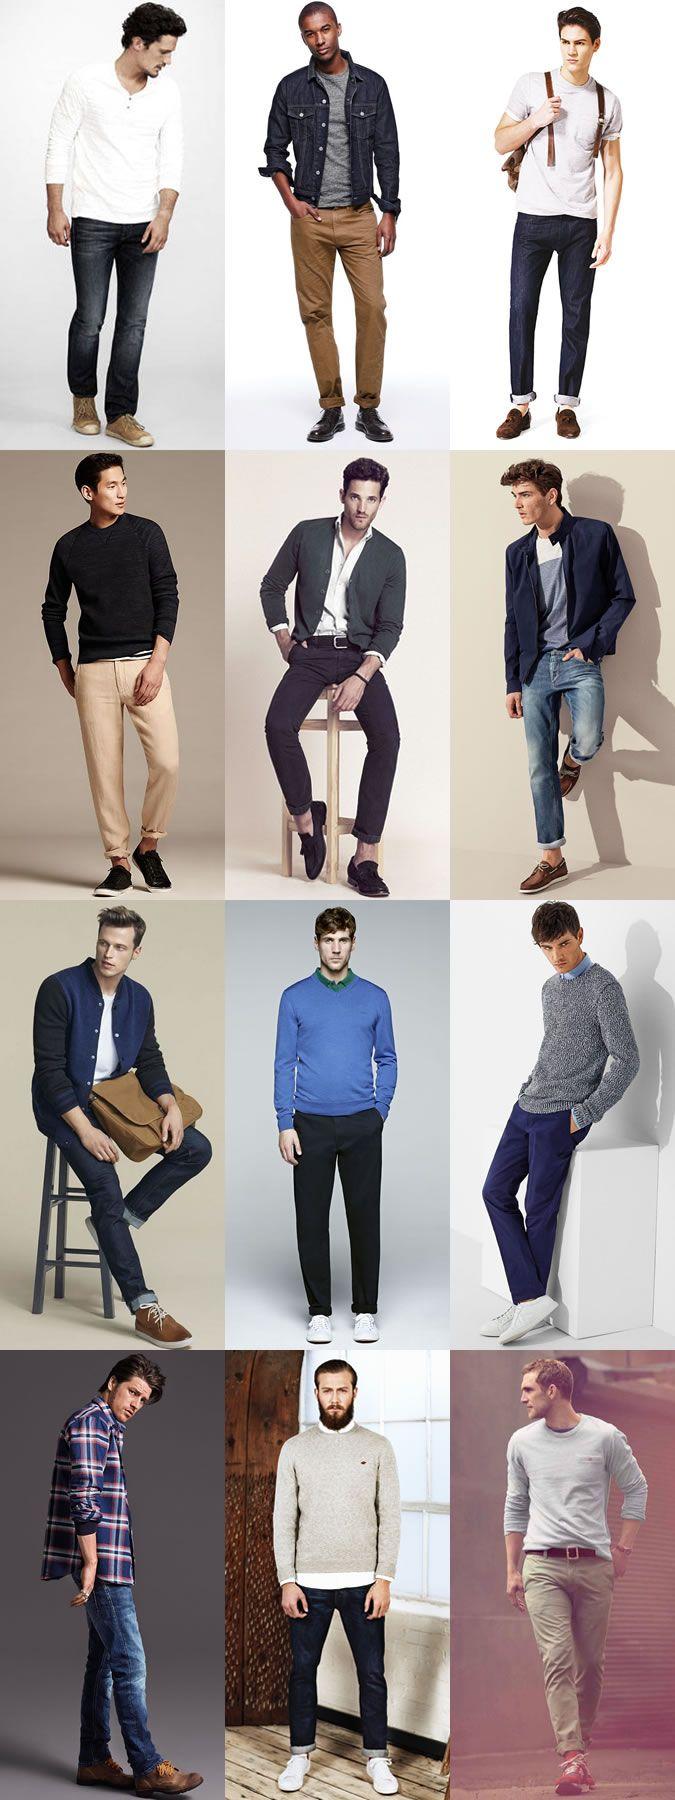 Best 25 University Style Ideas On Pinterest University Of Fashion University Outfit And